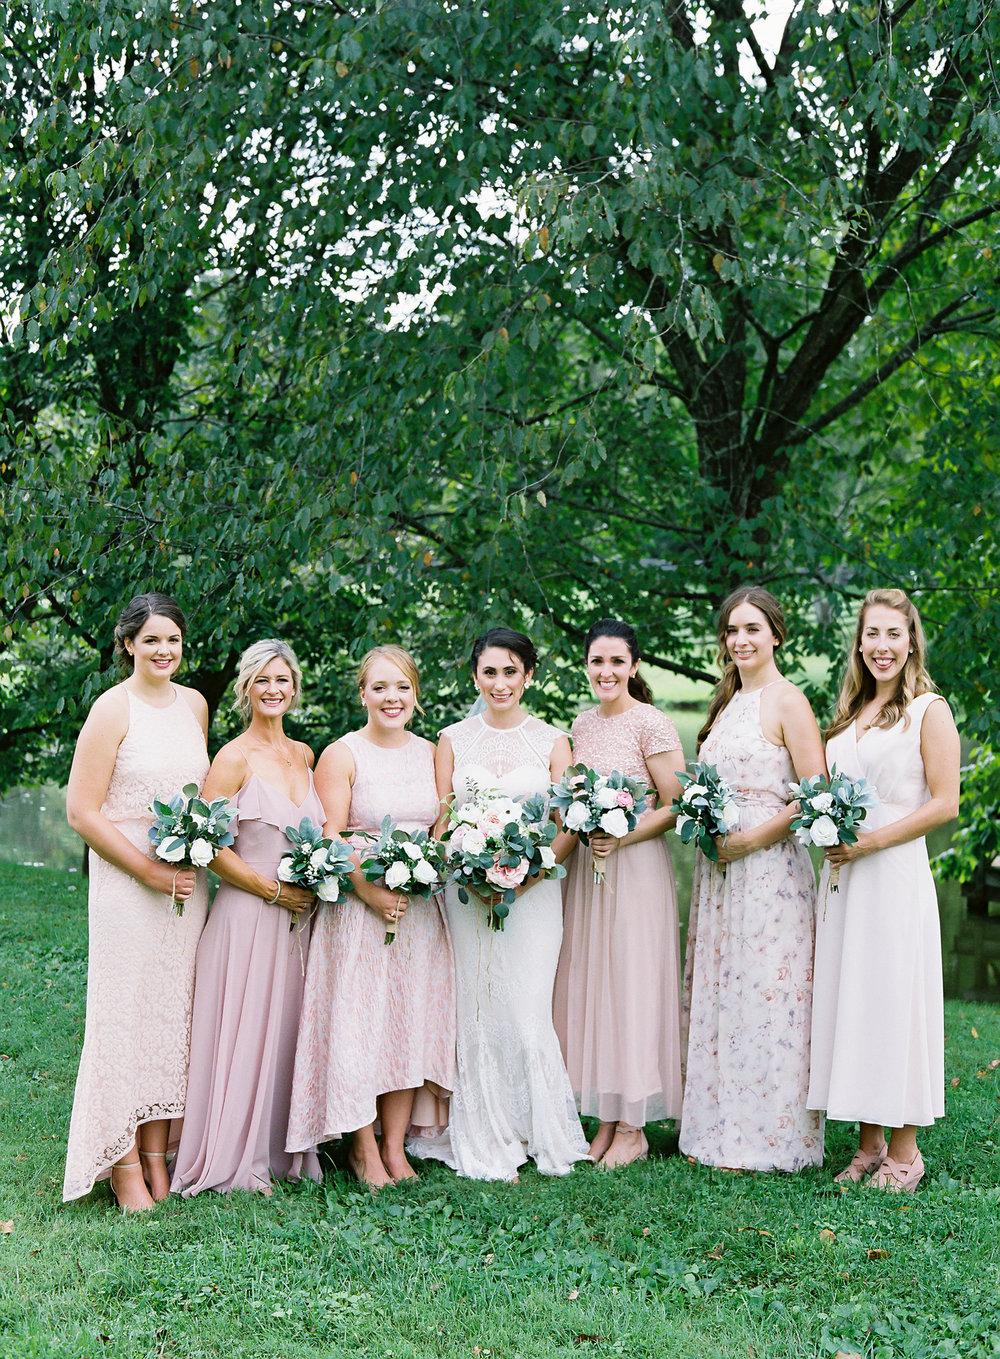 Vicki_Grafton_Photography_wedding-107.jpg